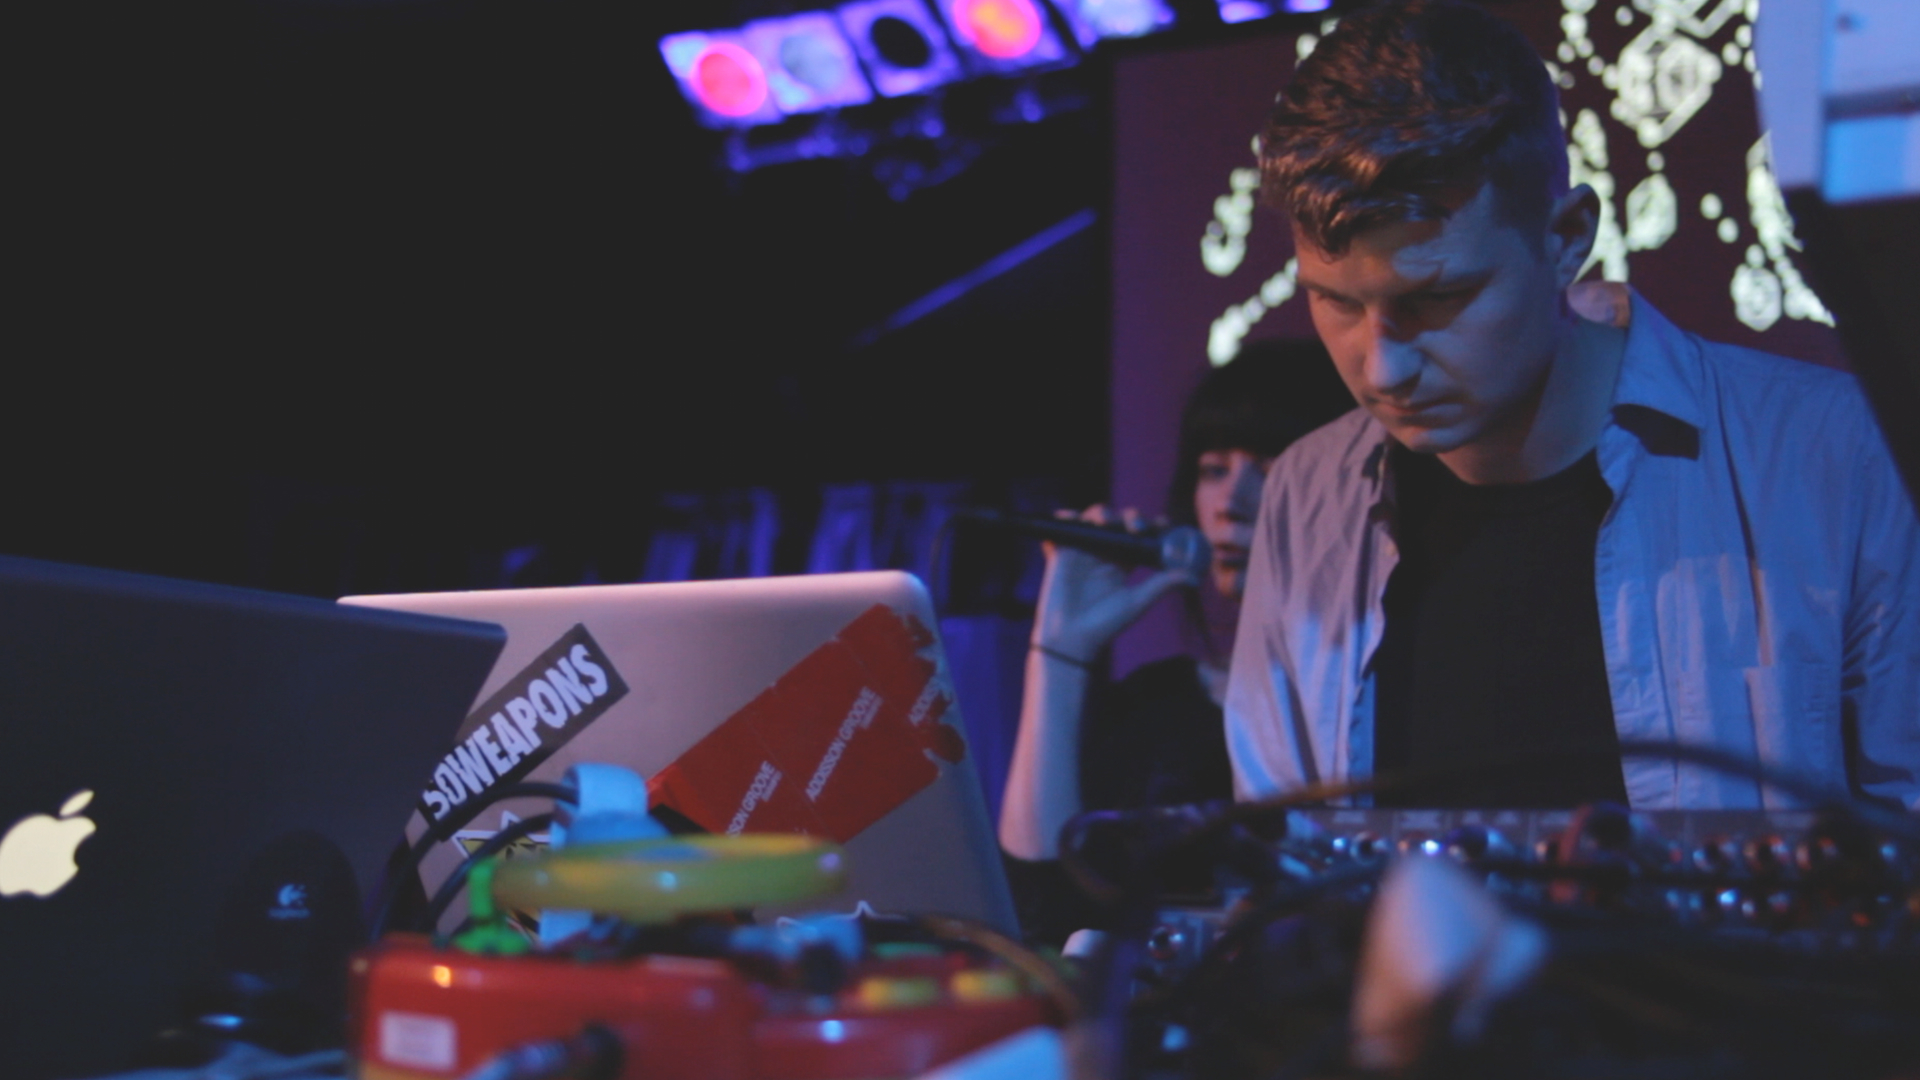 Addison groove Live & Experimental